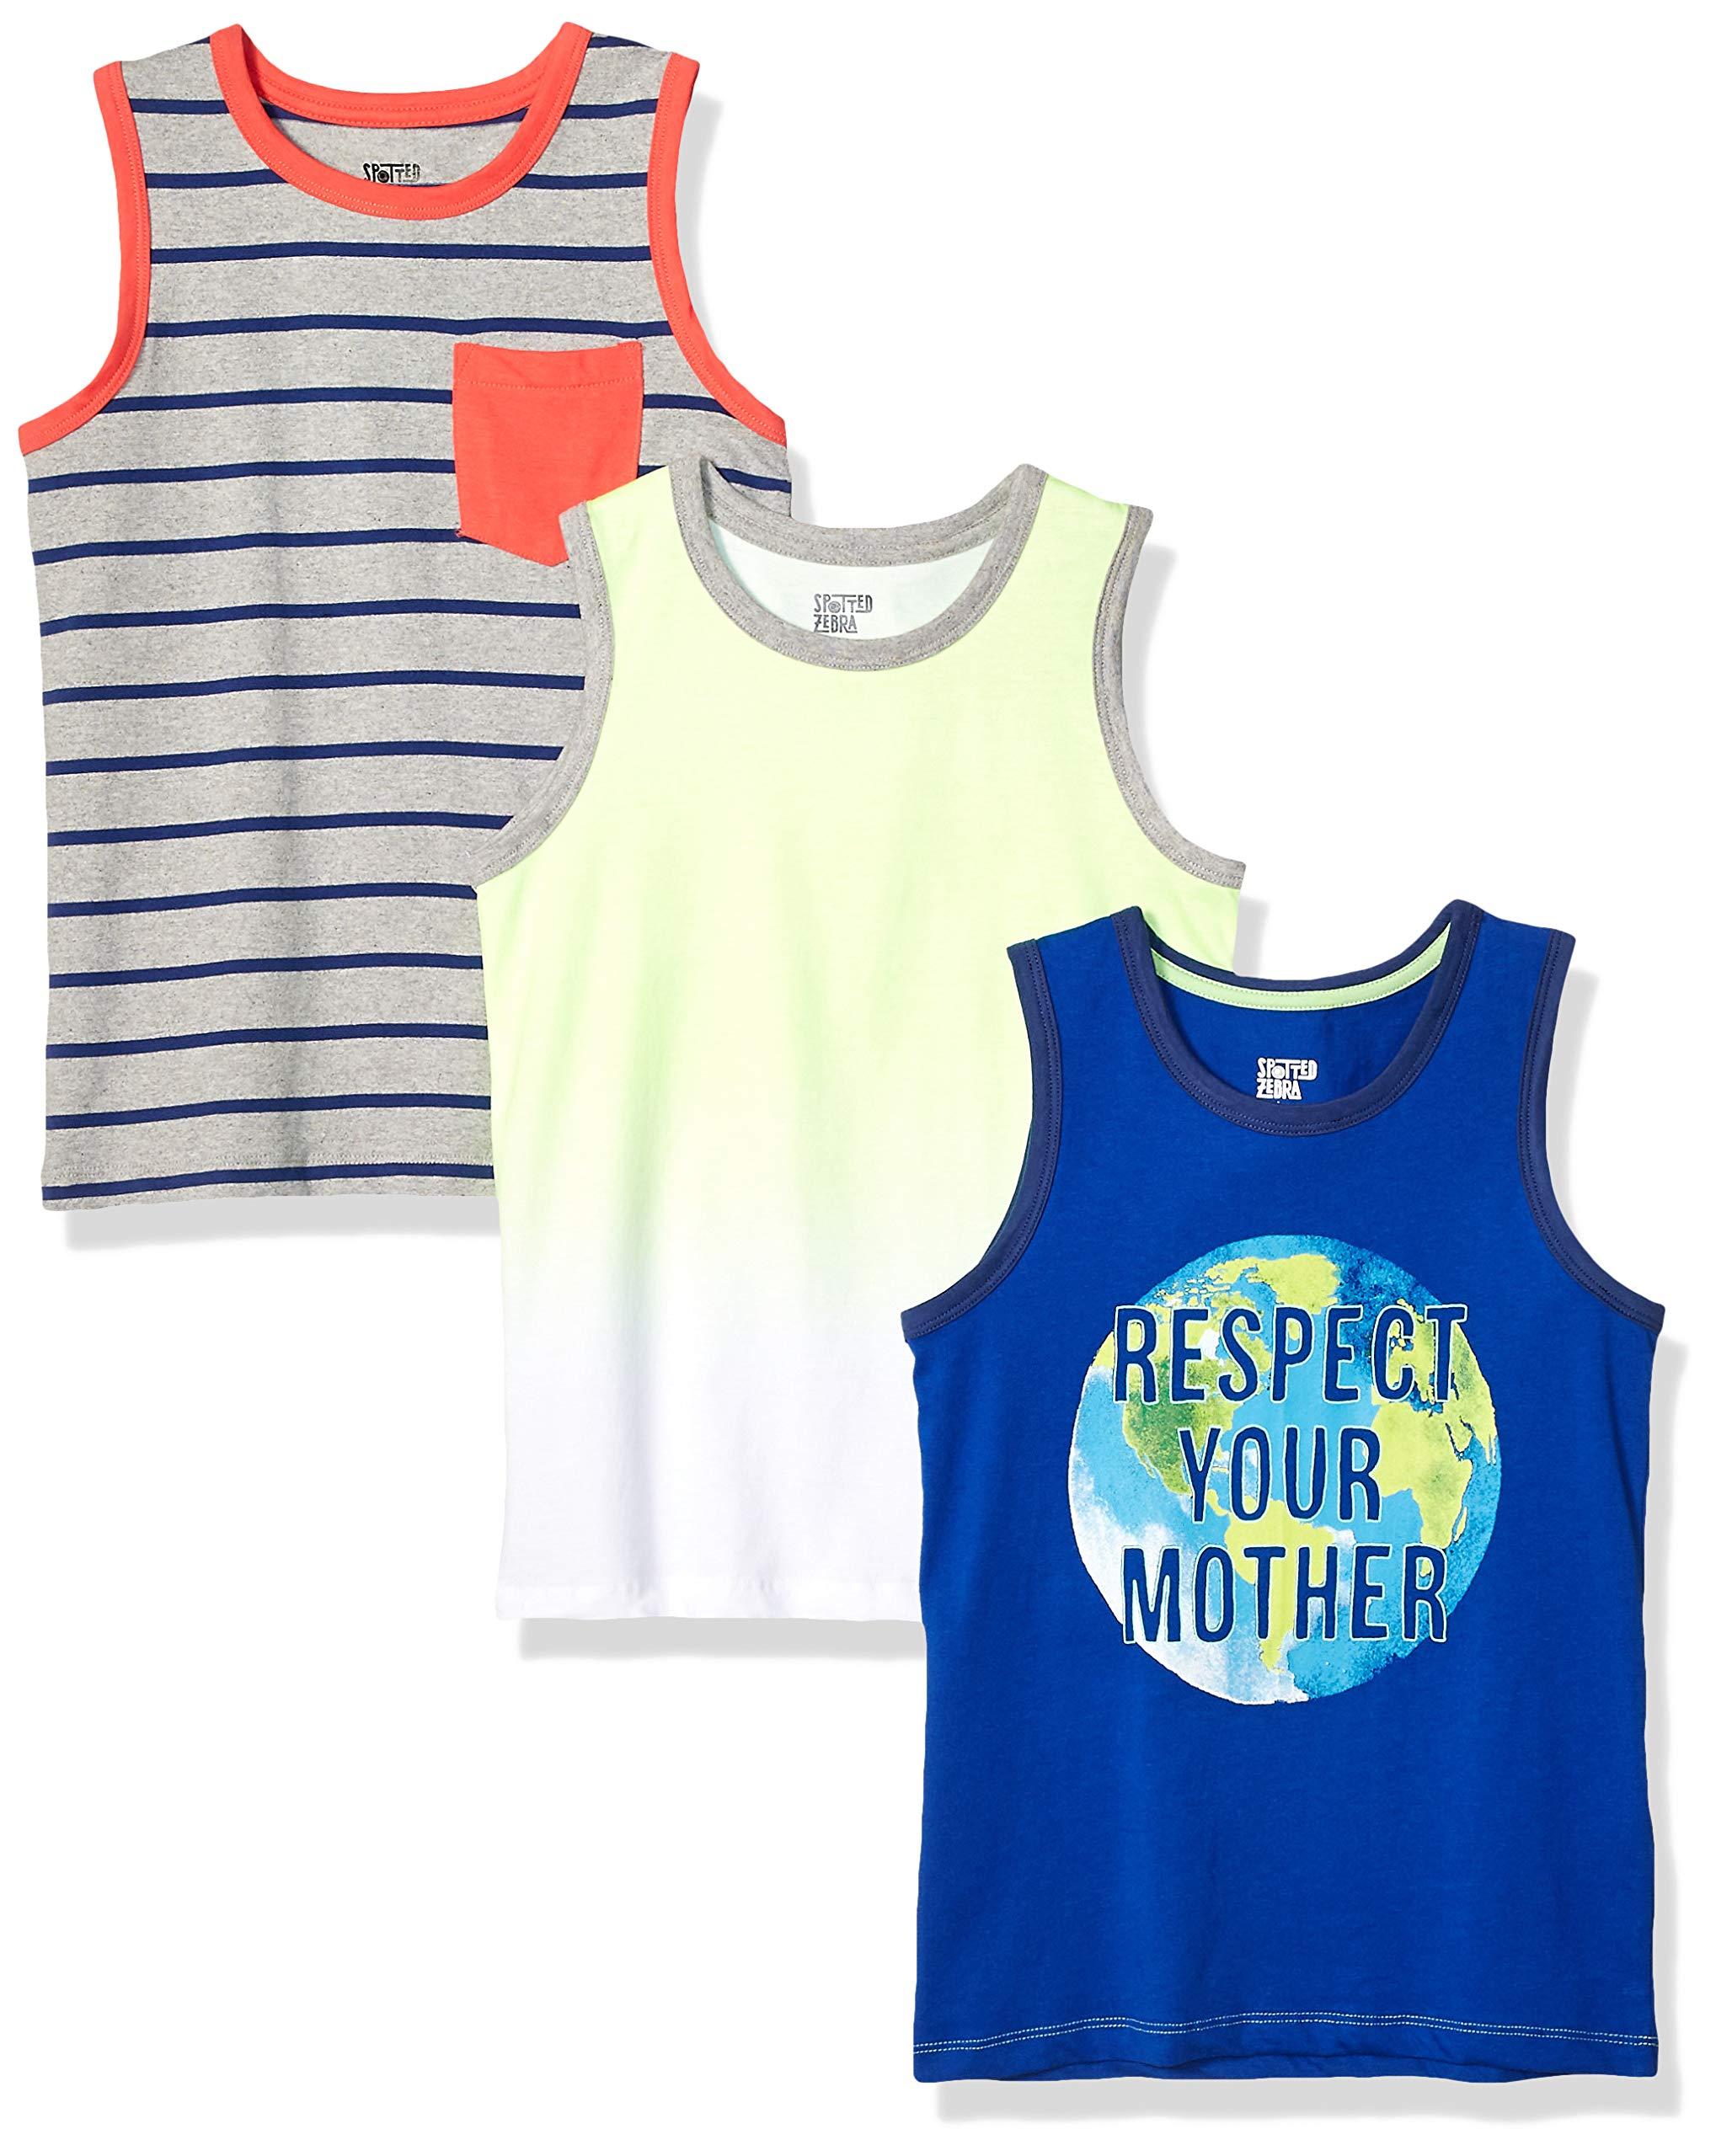 Amazon Brand - Spotted Zebra Boys' Toddler & Kids 3-Pack Sleeveless Tank Tops